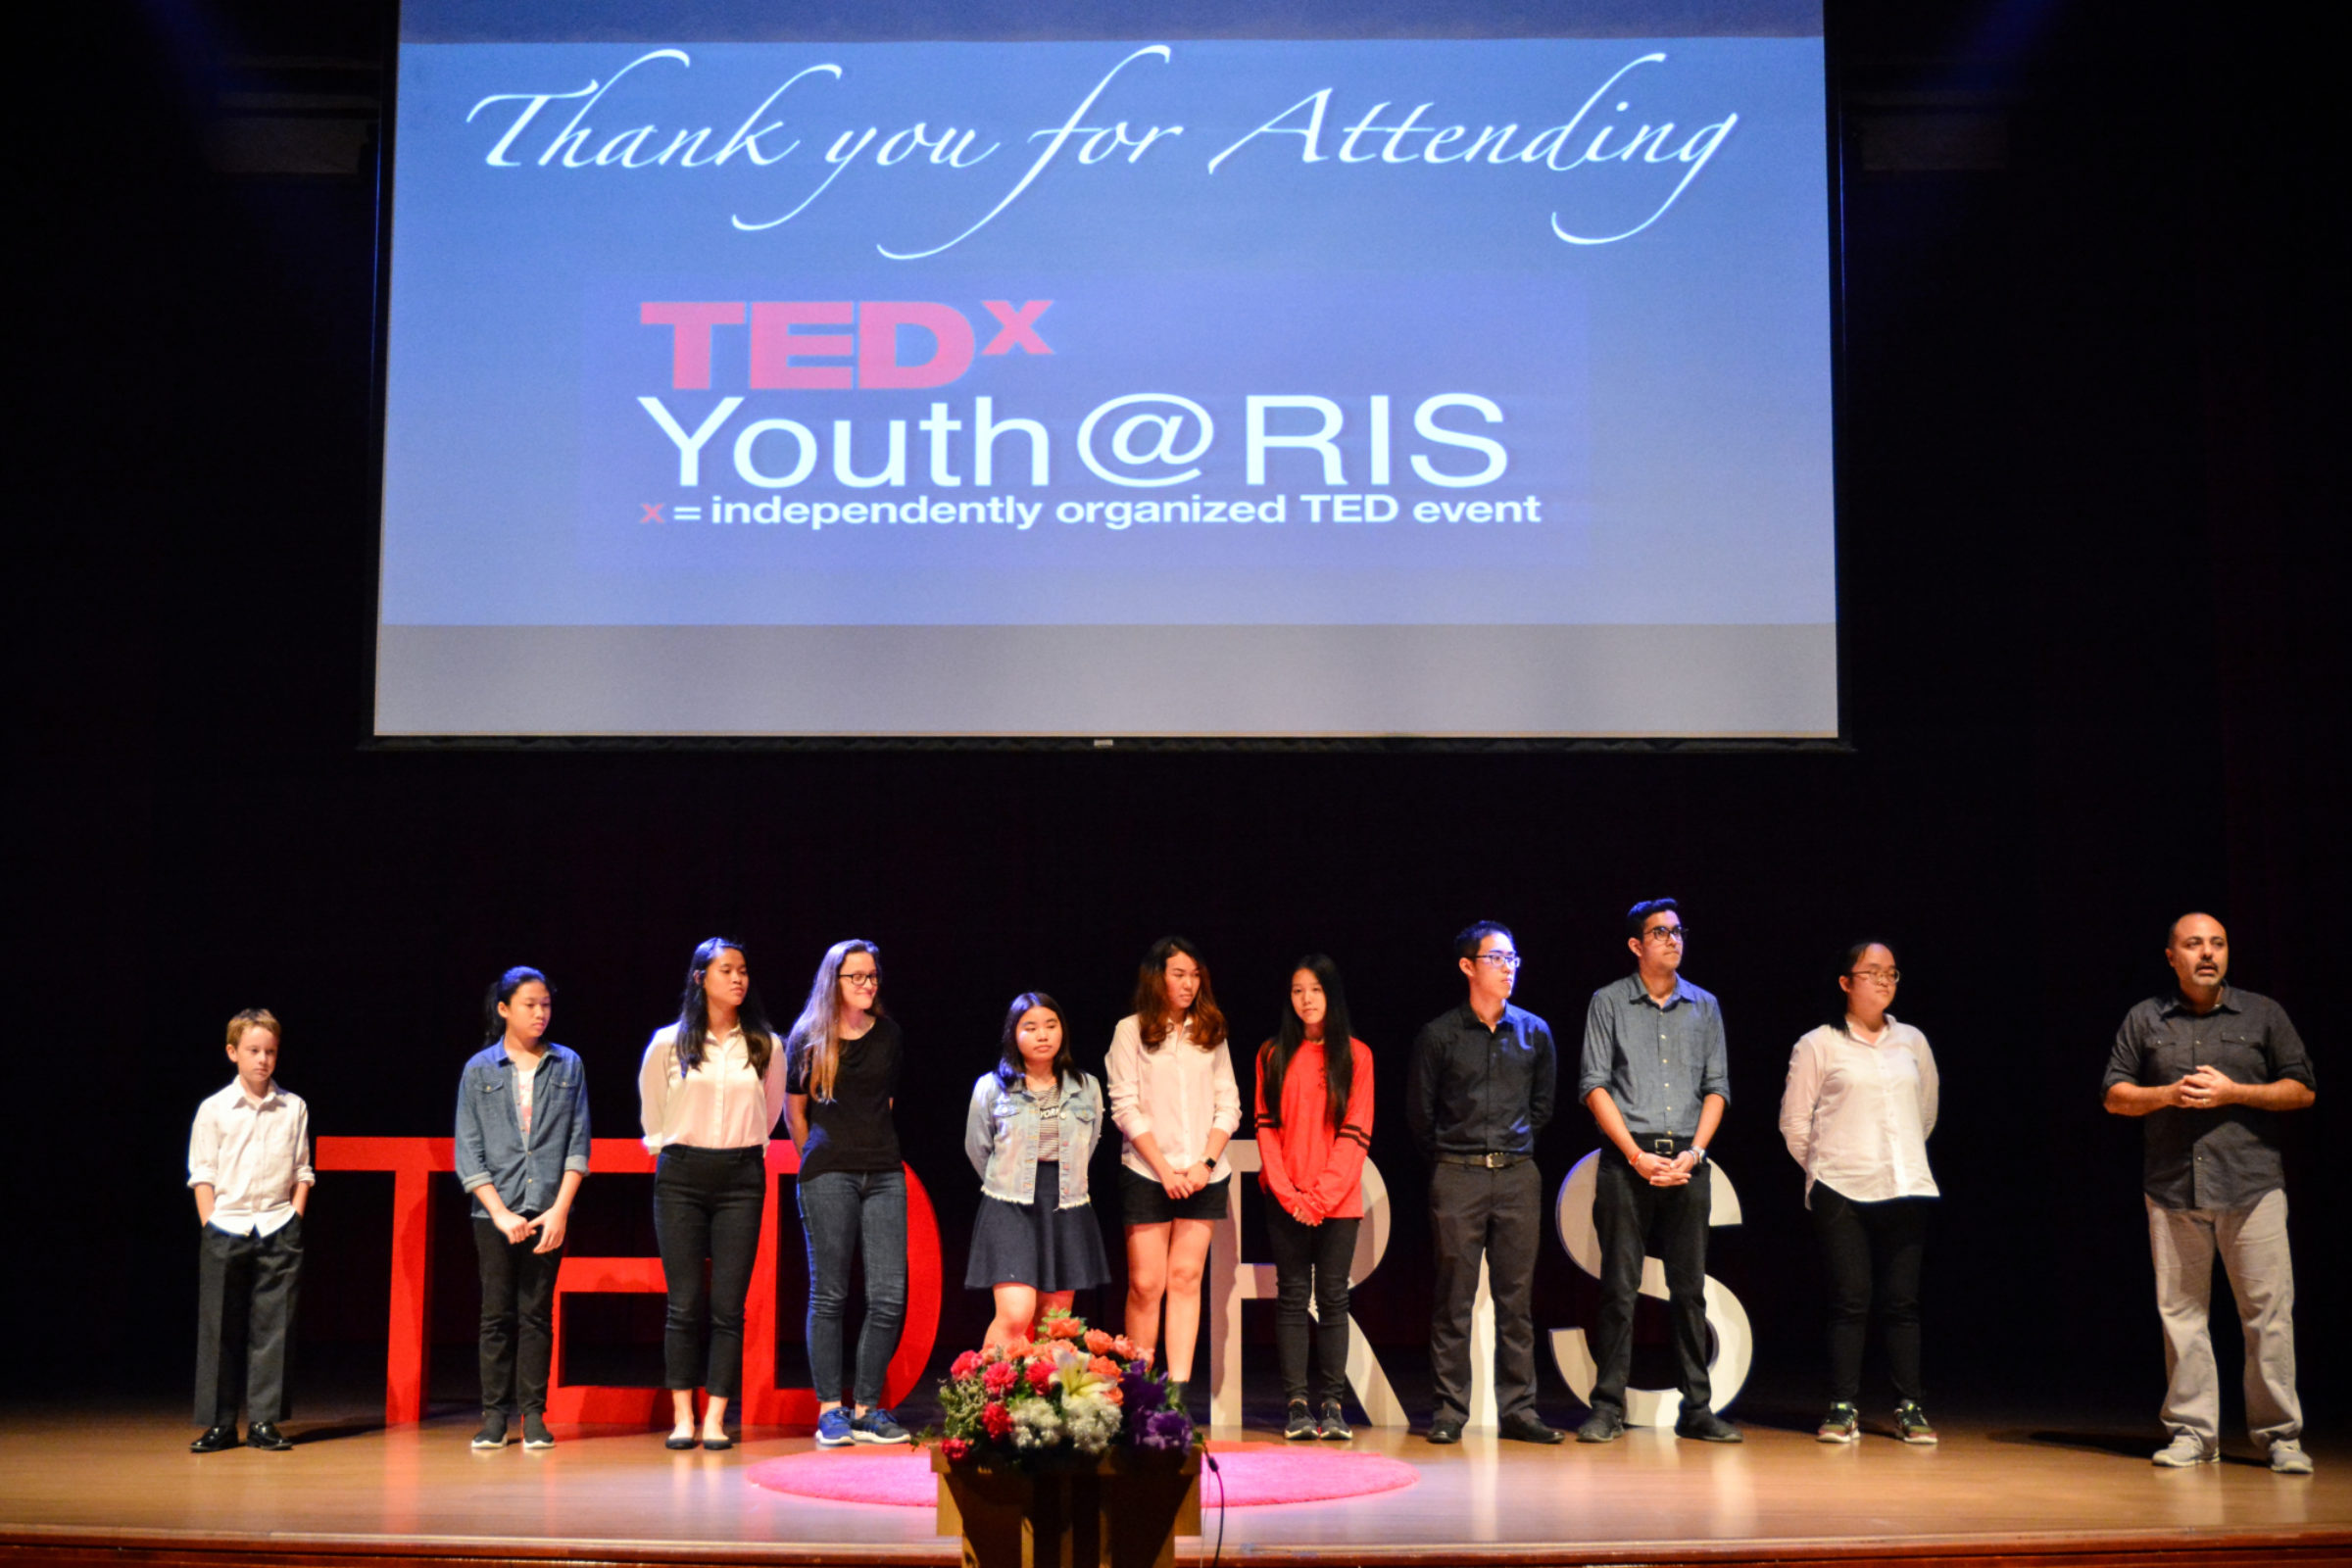 TEDx Talks @ RIS